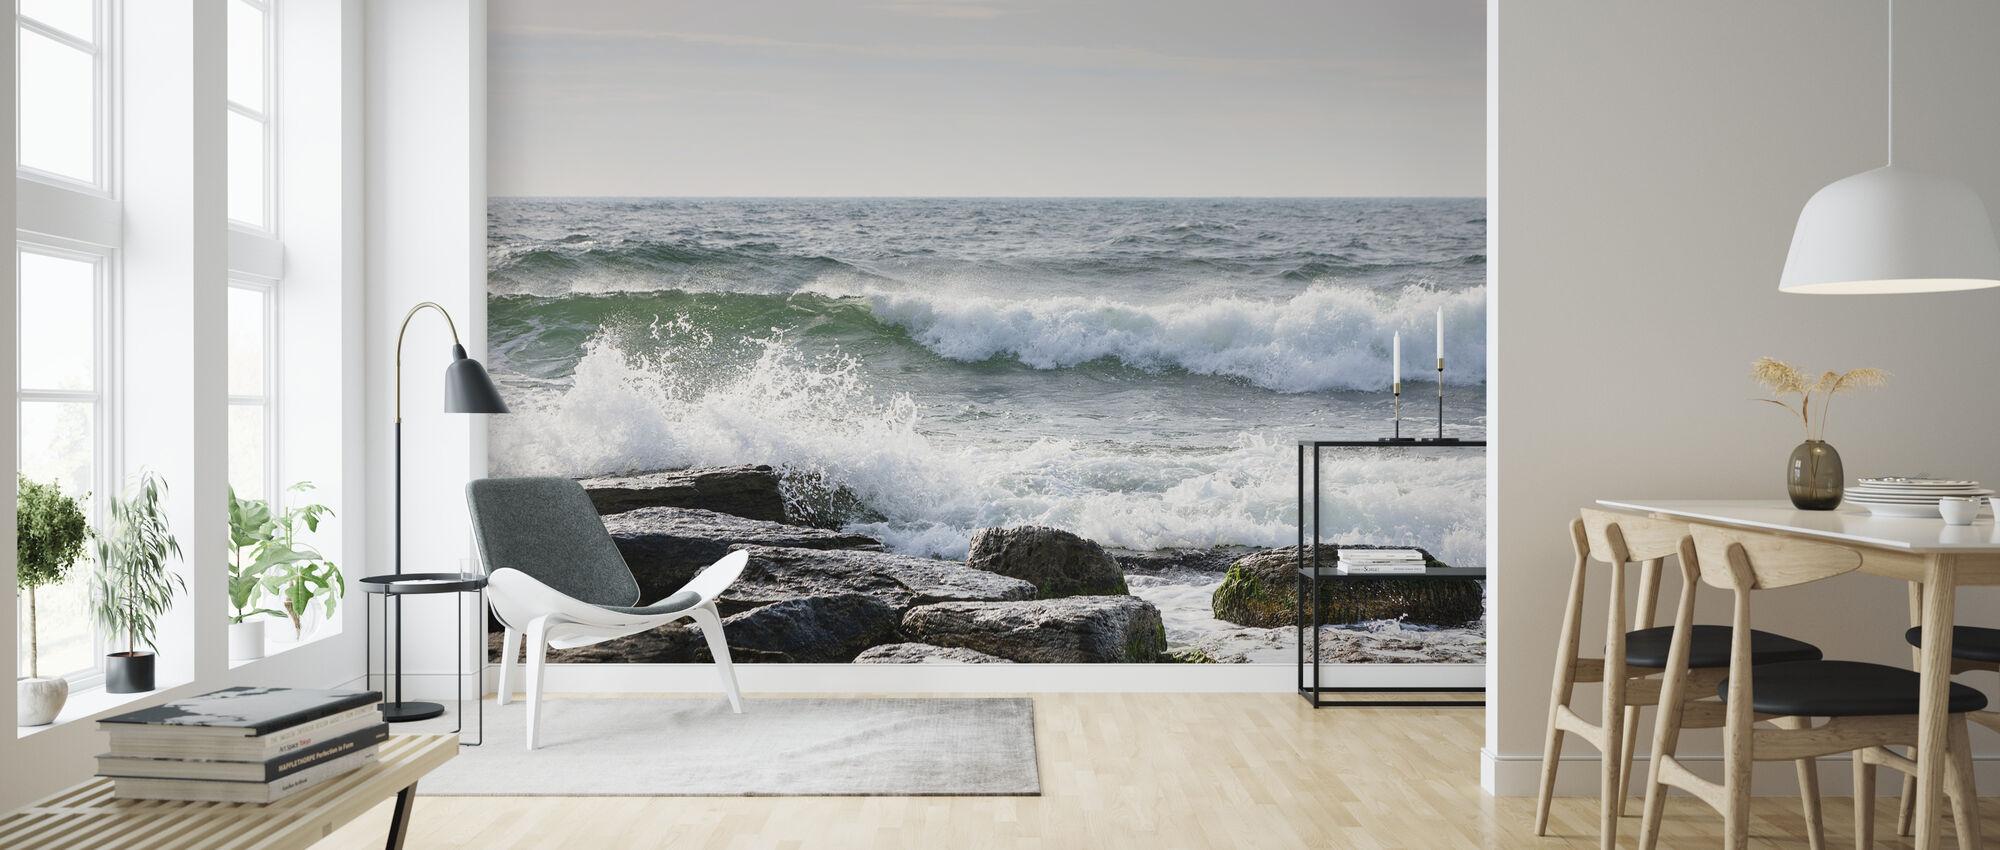 Breakers - Wallpaper - Living Room